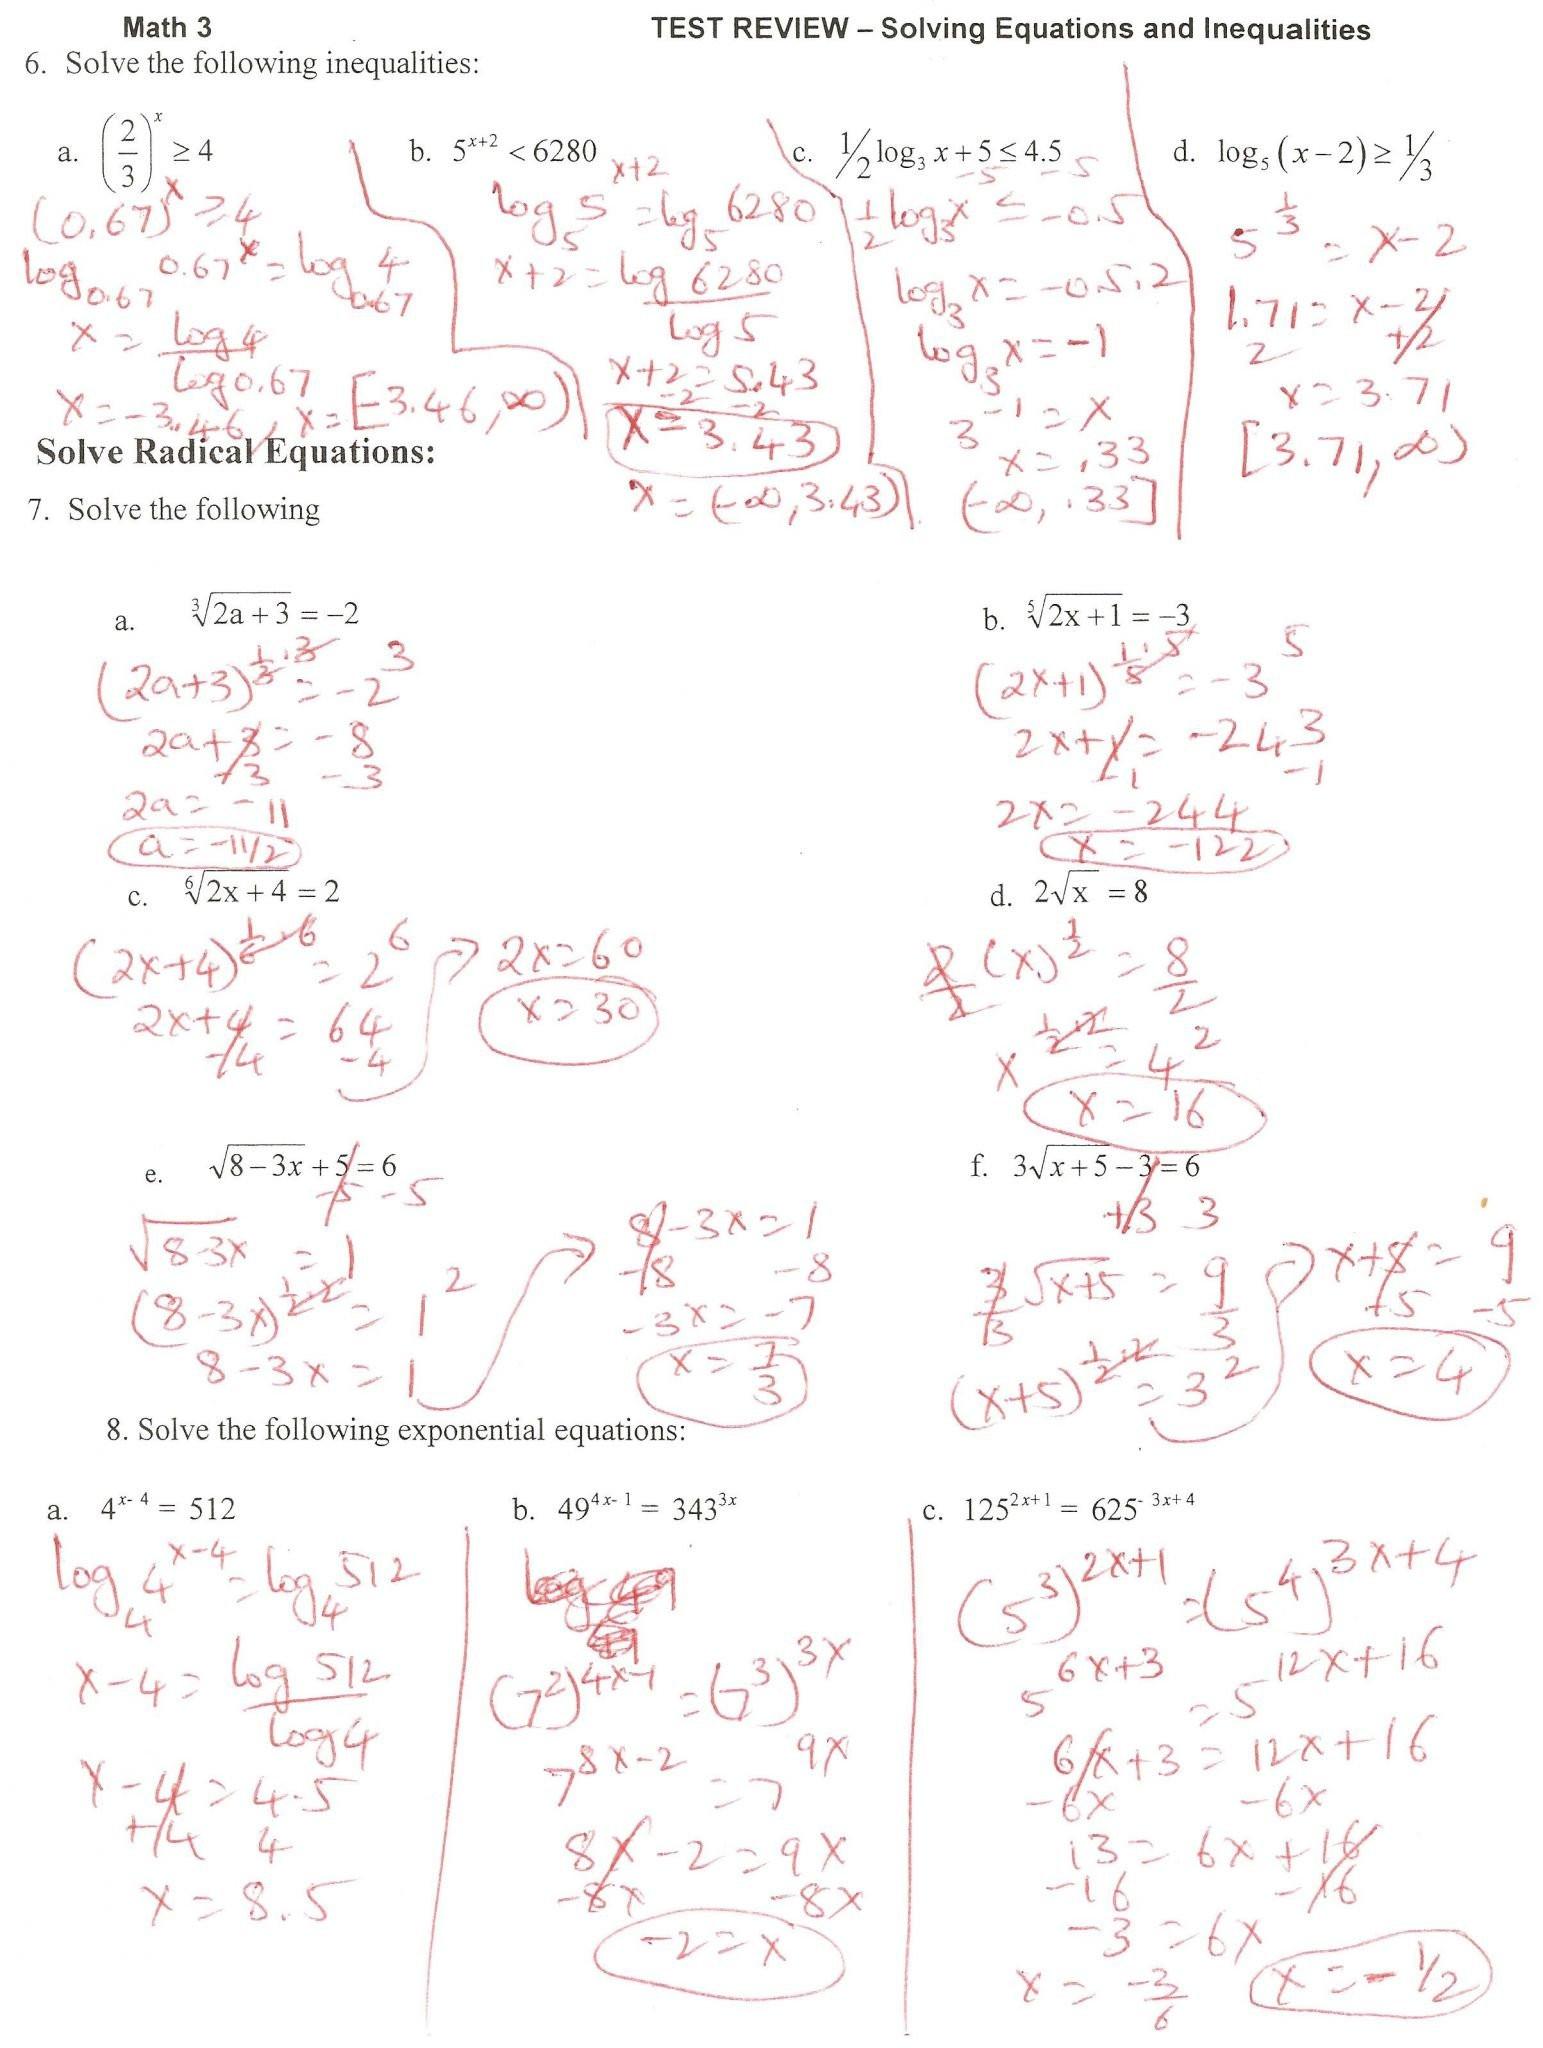 Solving Logarithmic Equations Worksheet solving Exponential and Logarithmic Equations Worksheet